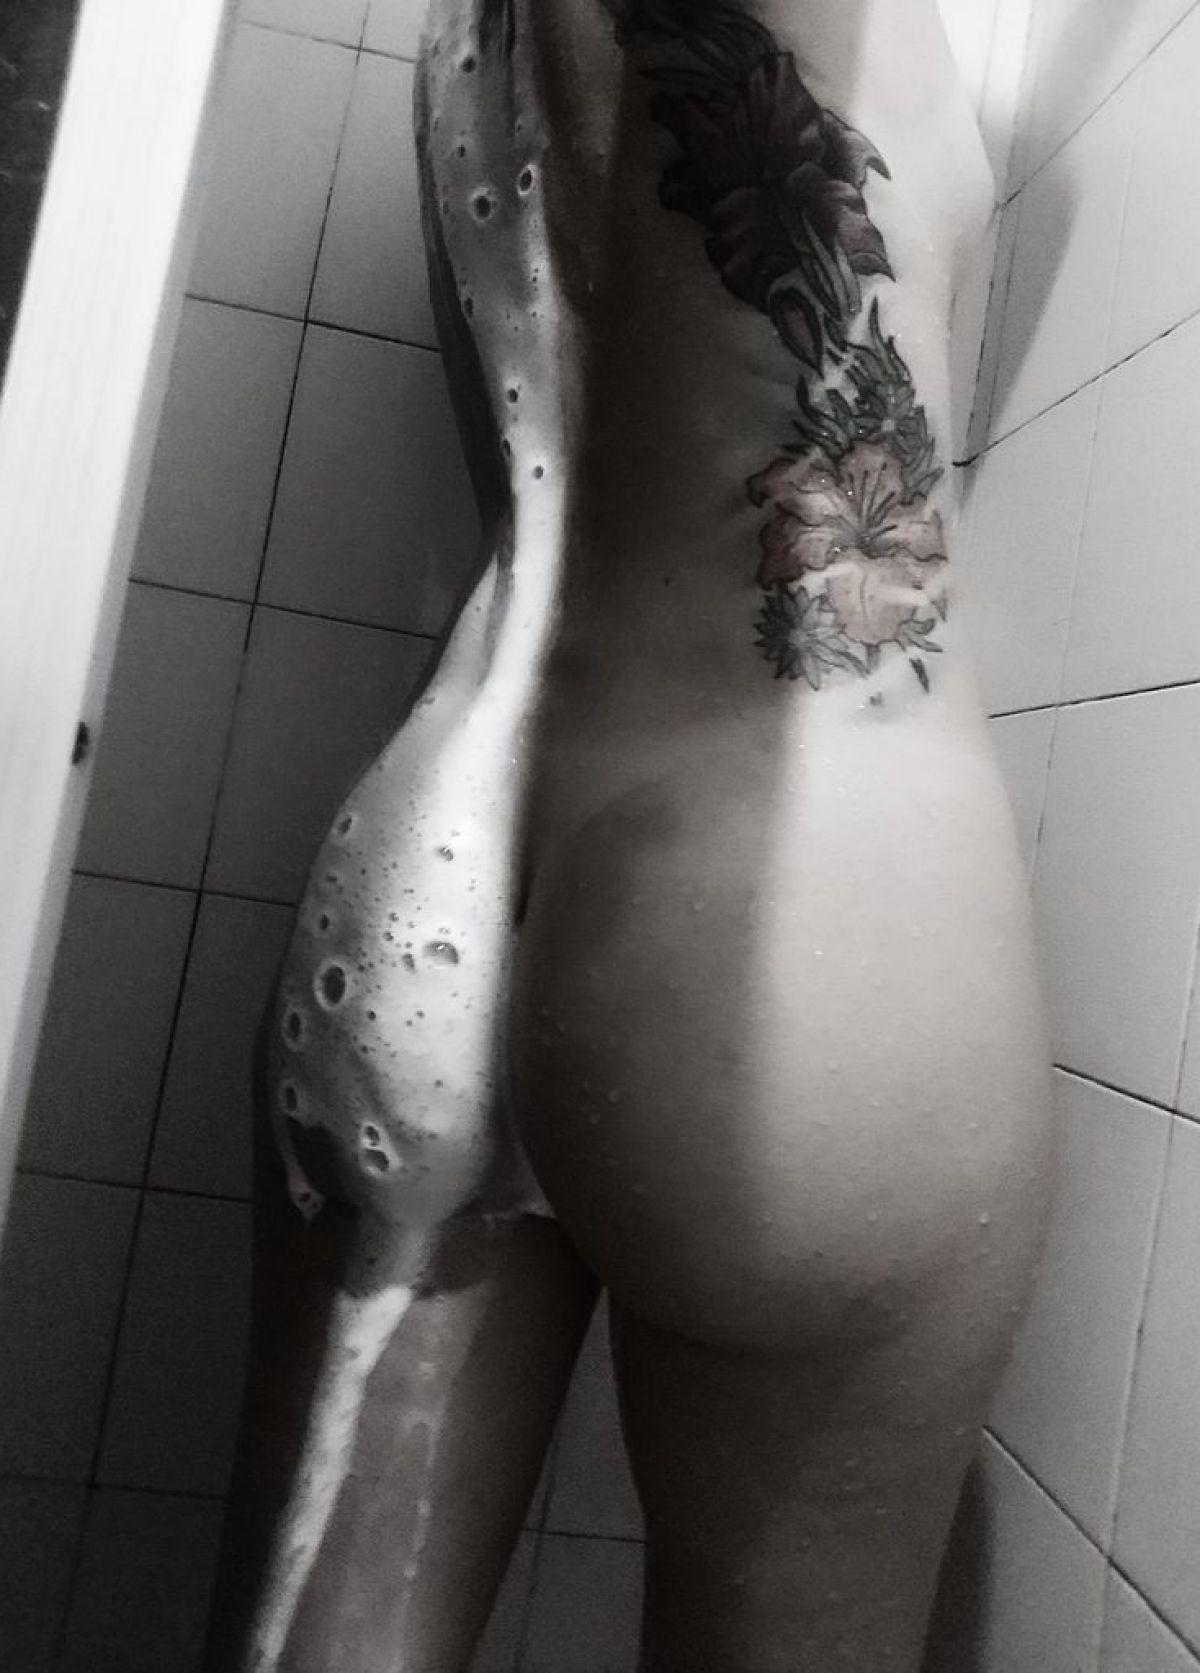 Camgirl GingerGirl no banho